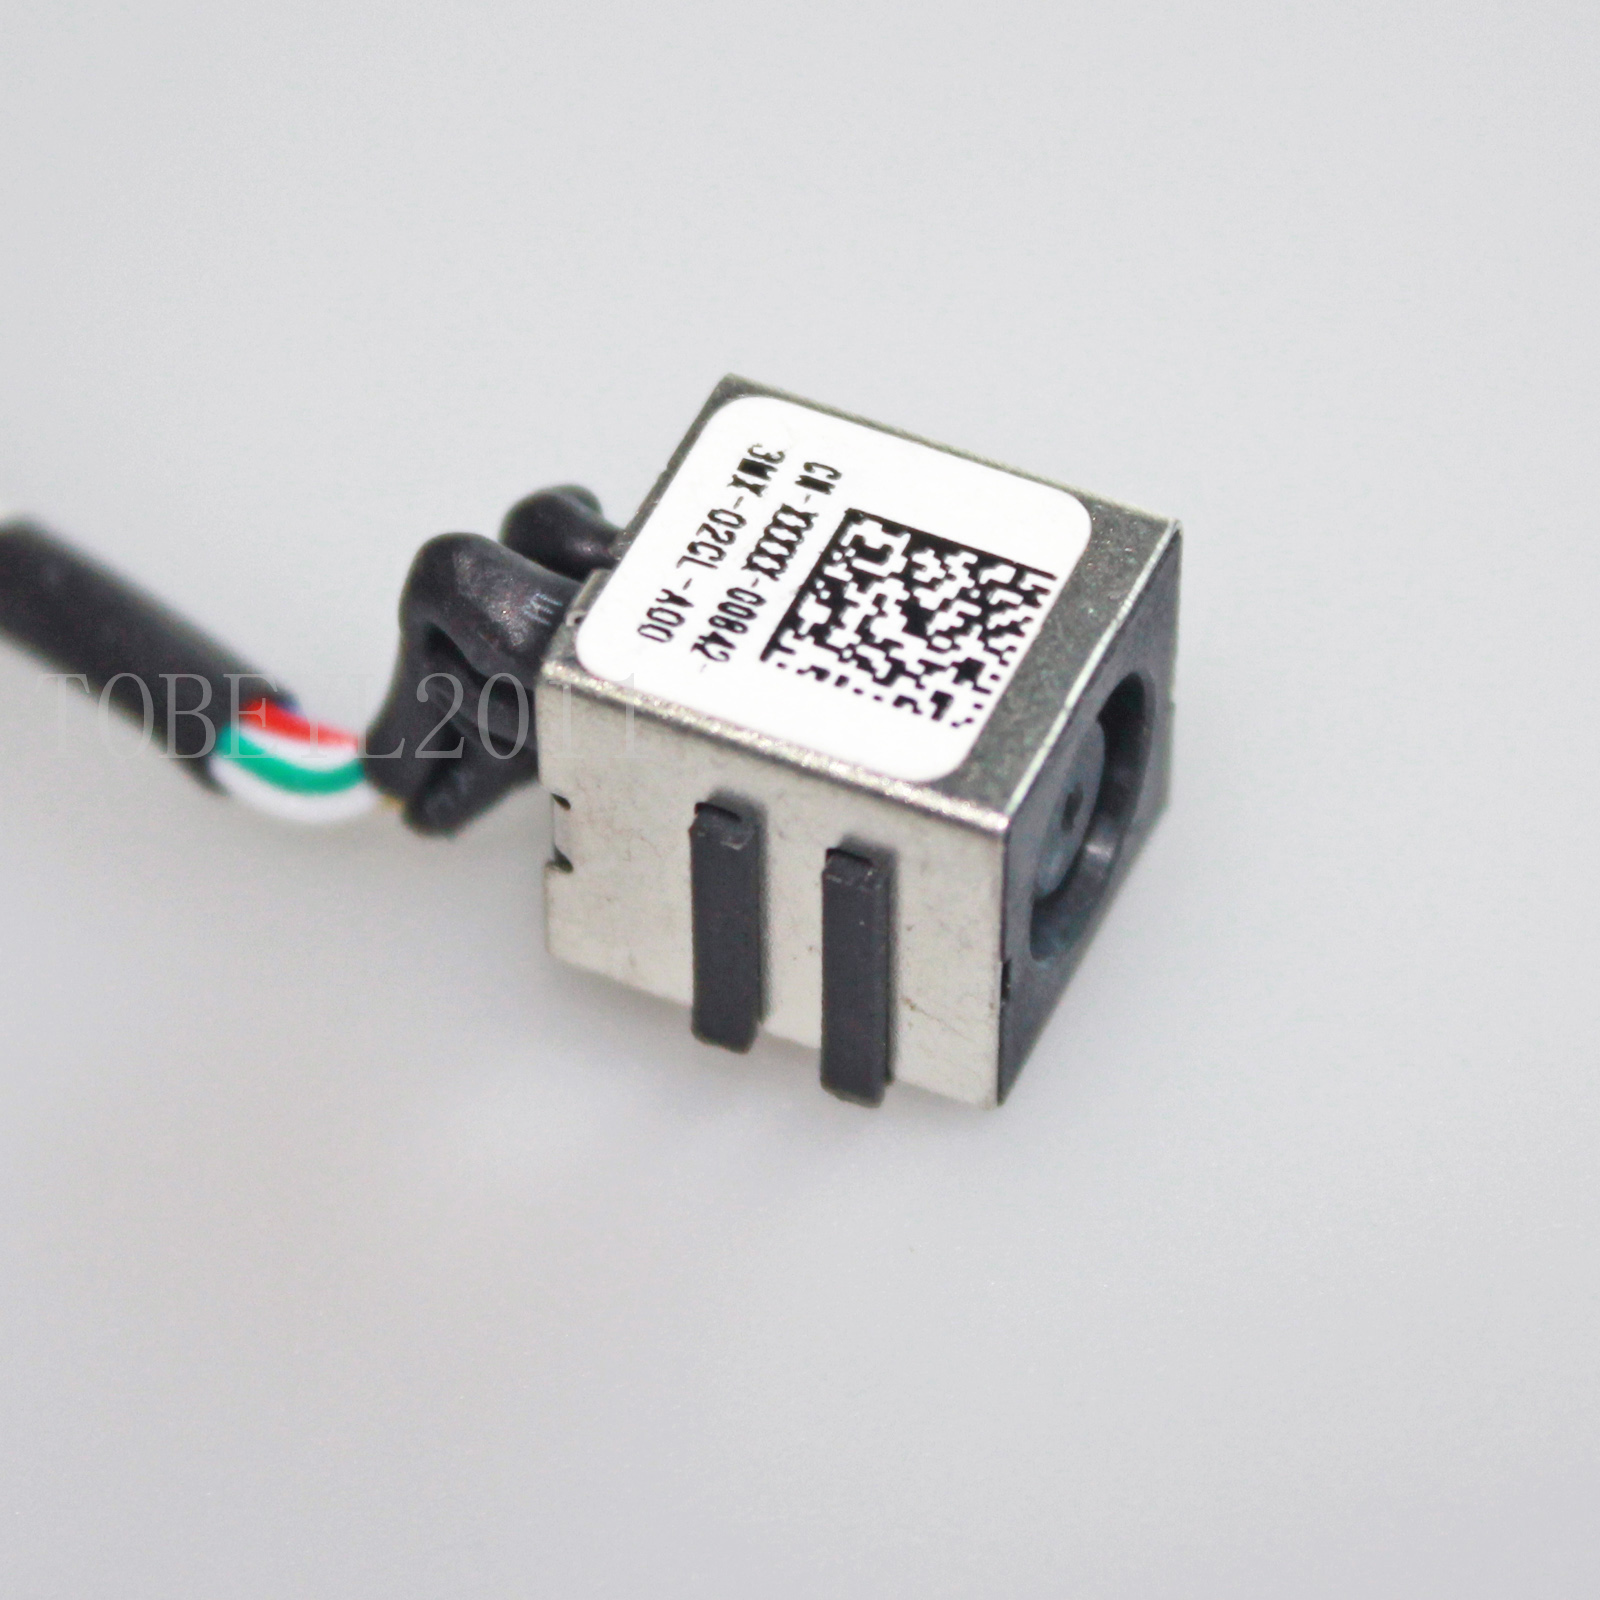 Dell DC Power Cable Inspiron 17R 5720 7720 N5720 N7720 DD0R09AD000  9J29V 09J29V